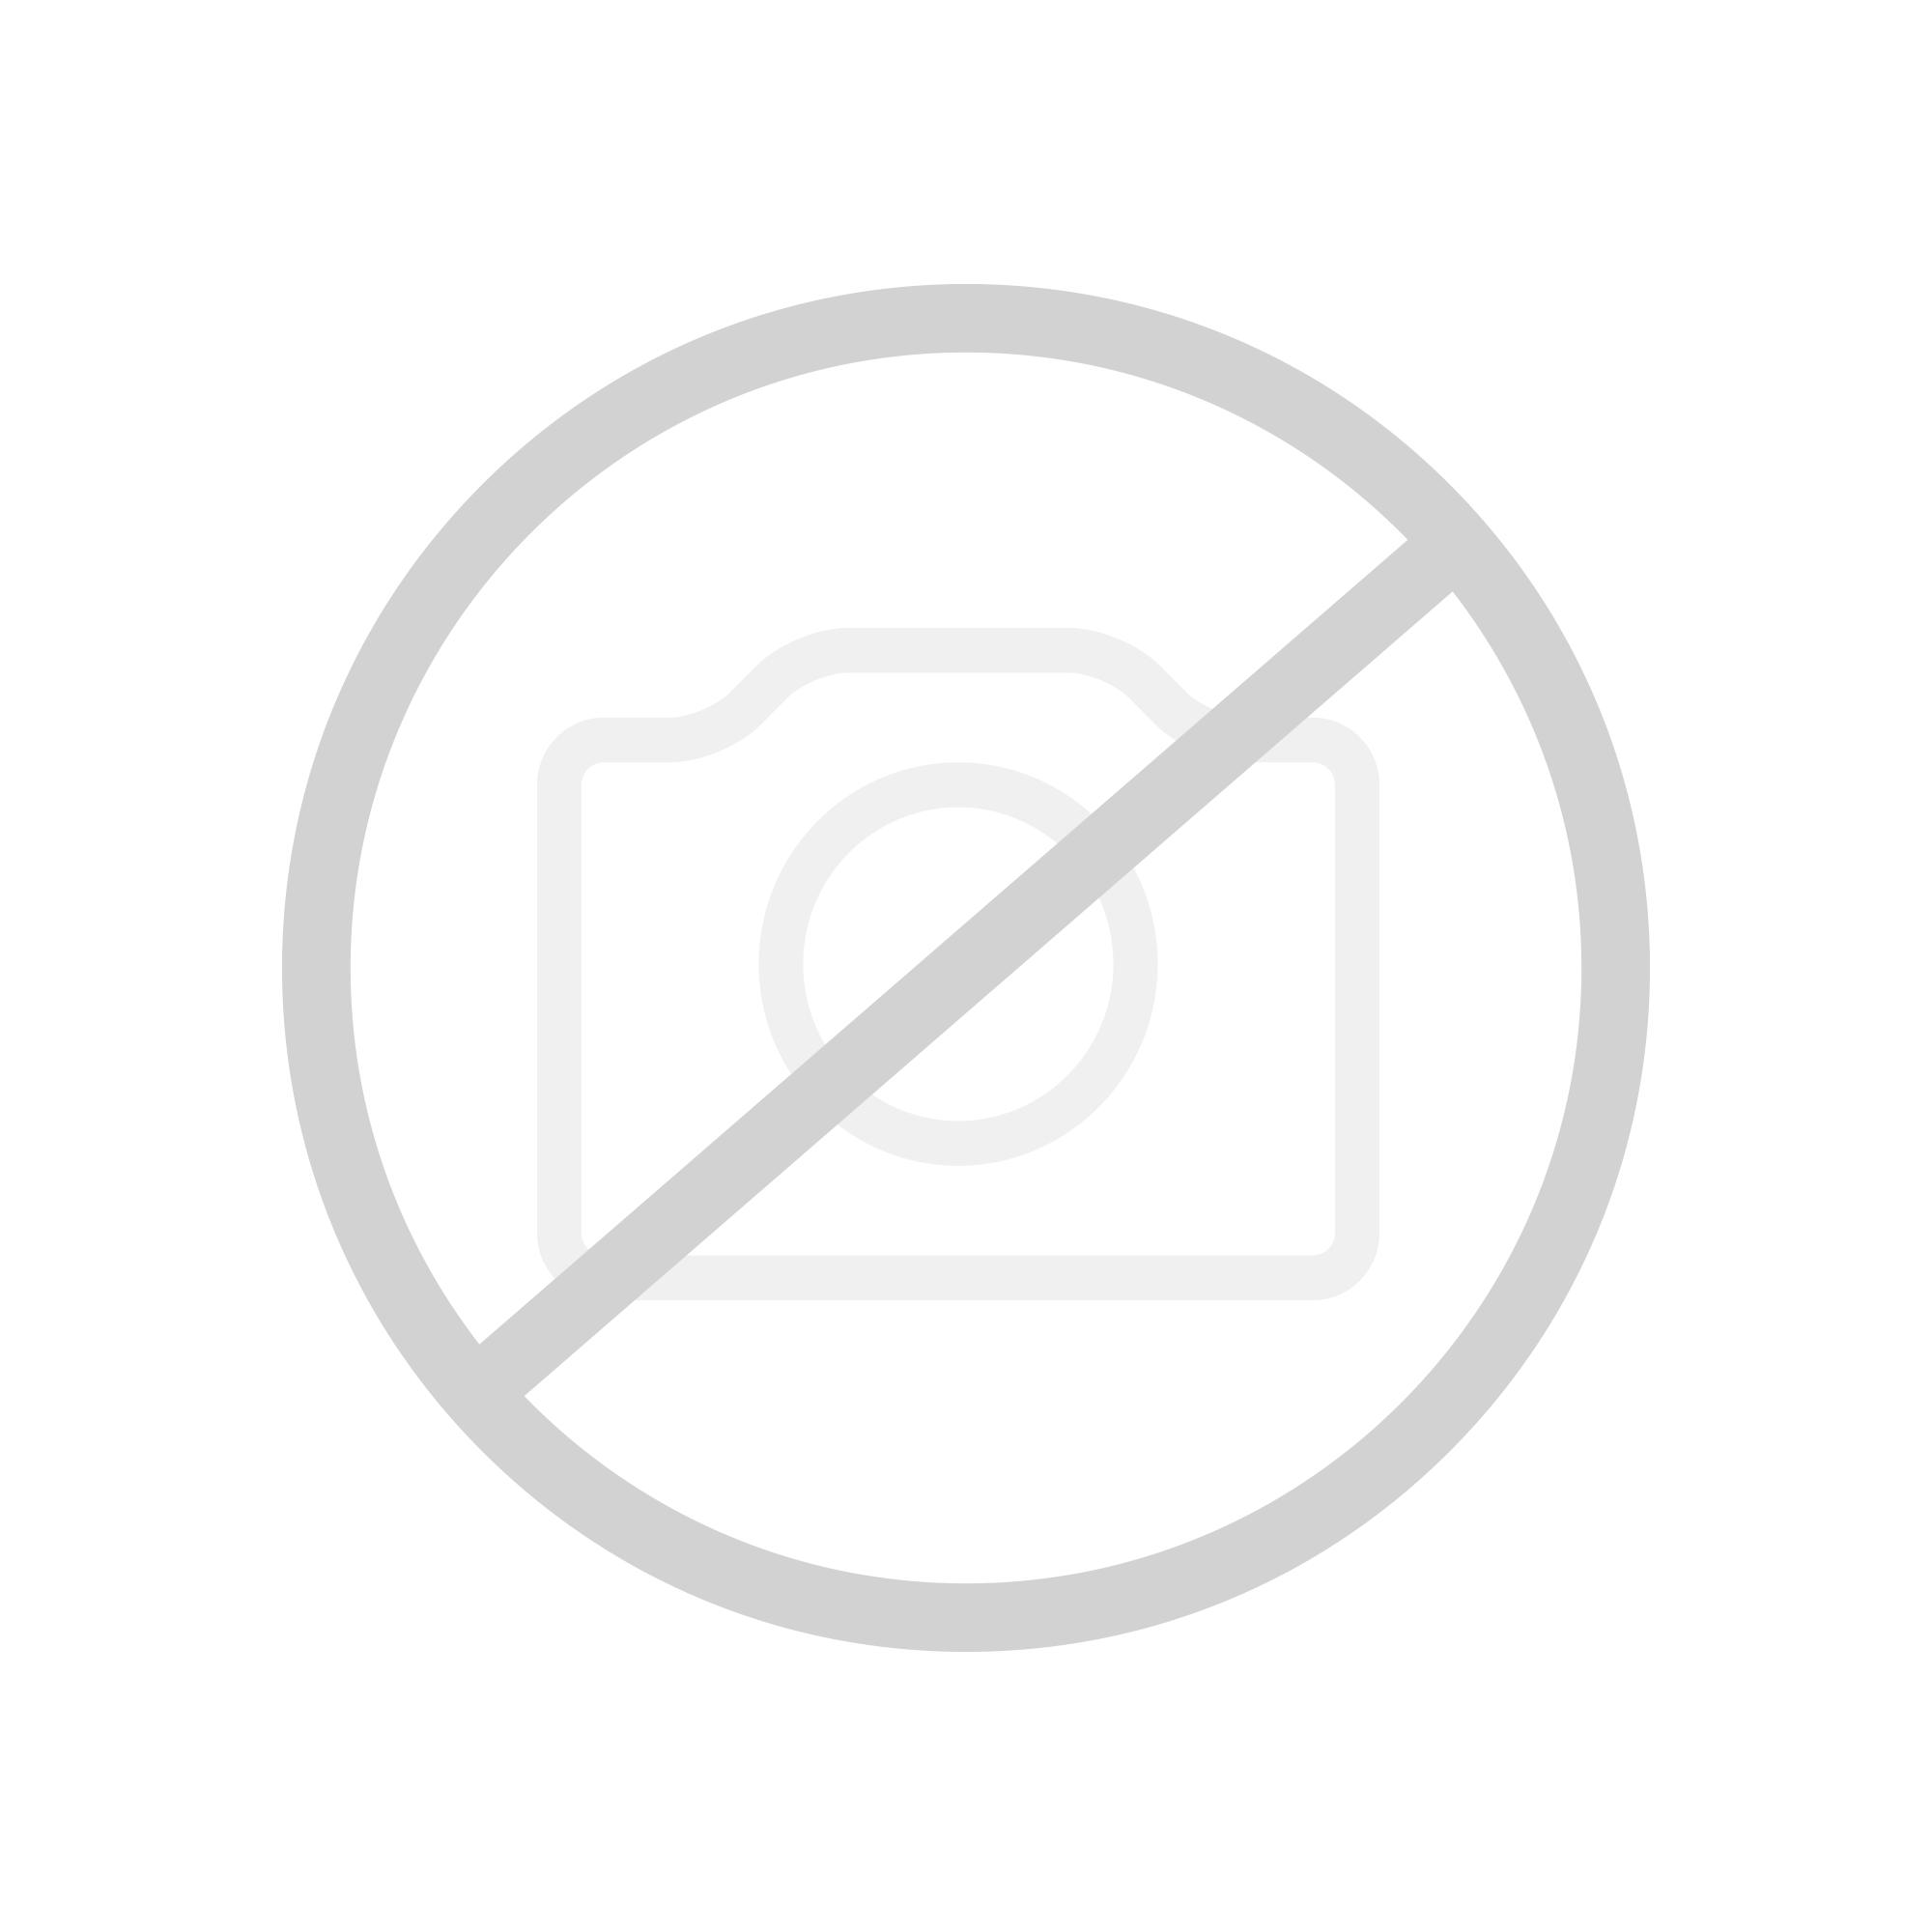 Steinberg Serie 170 freistehende Wanne/Brause-Armatur